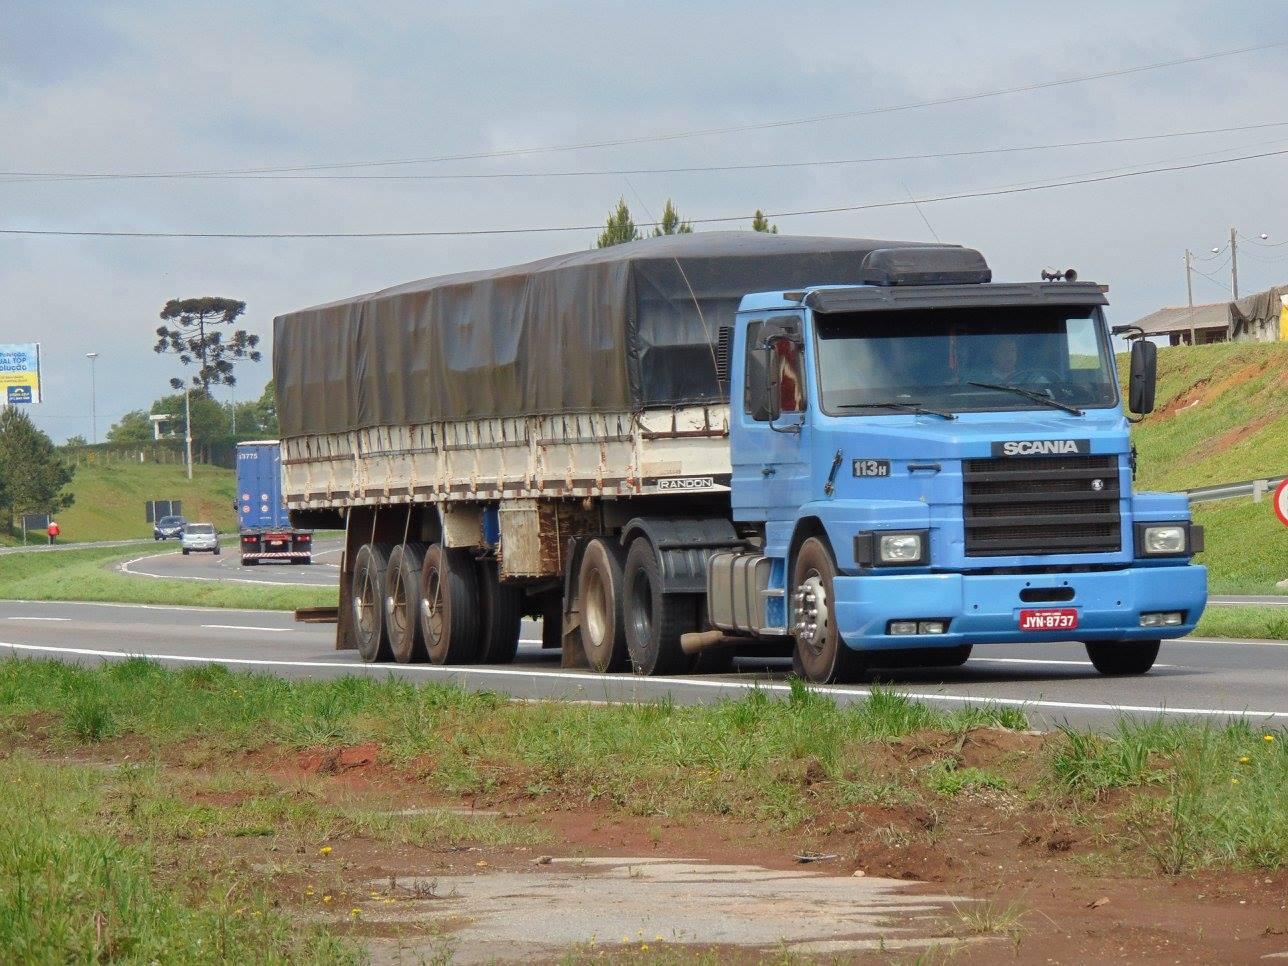 Scania-photo-5-1--2015-42